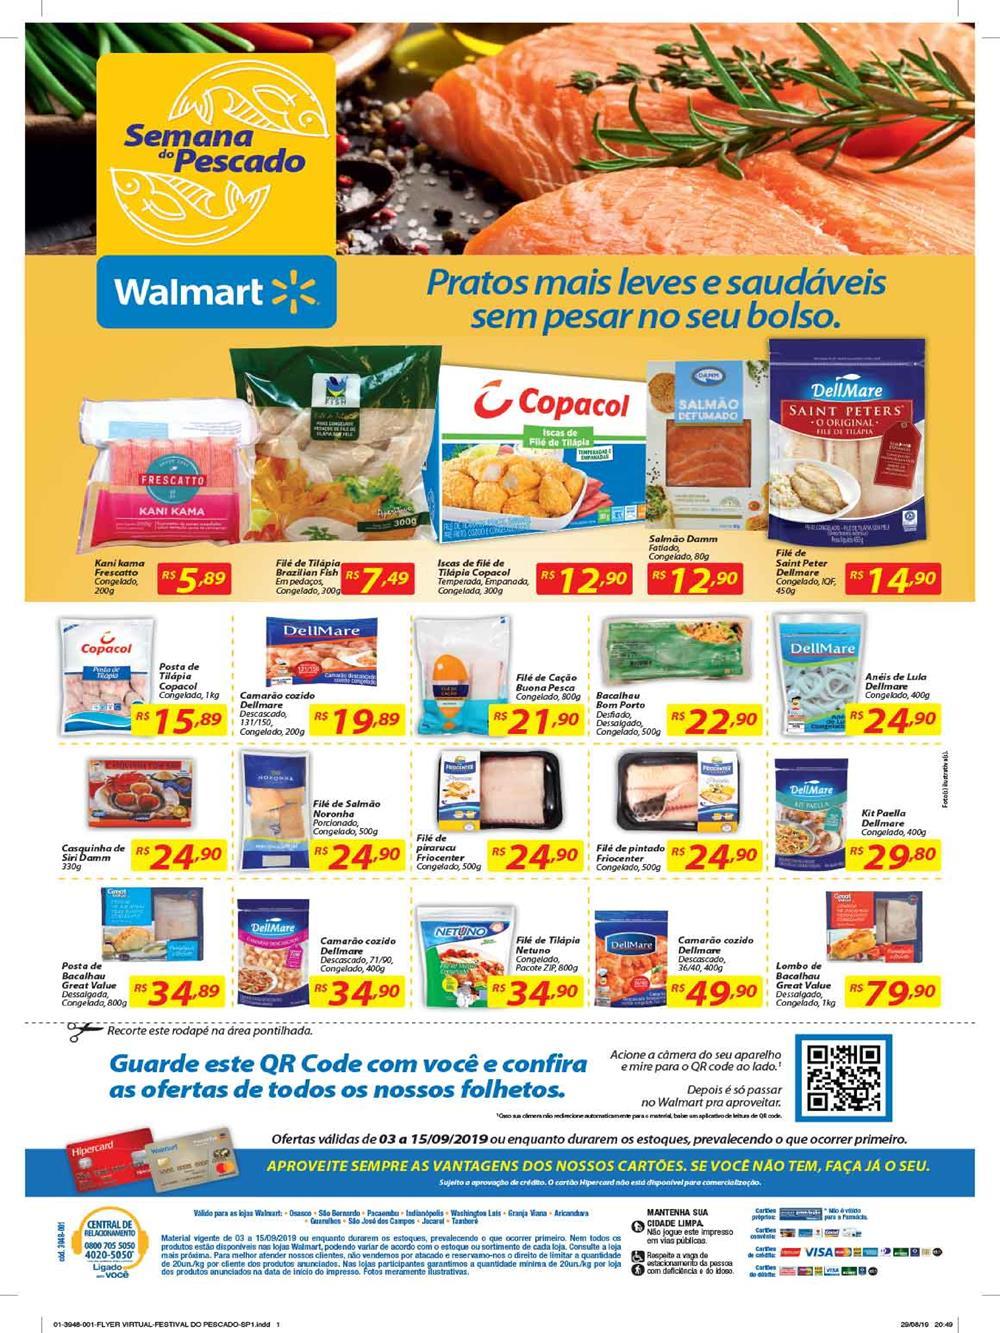 Ofertas-walmart1 Walmart para 14/09